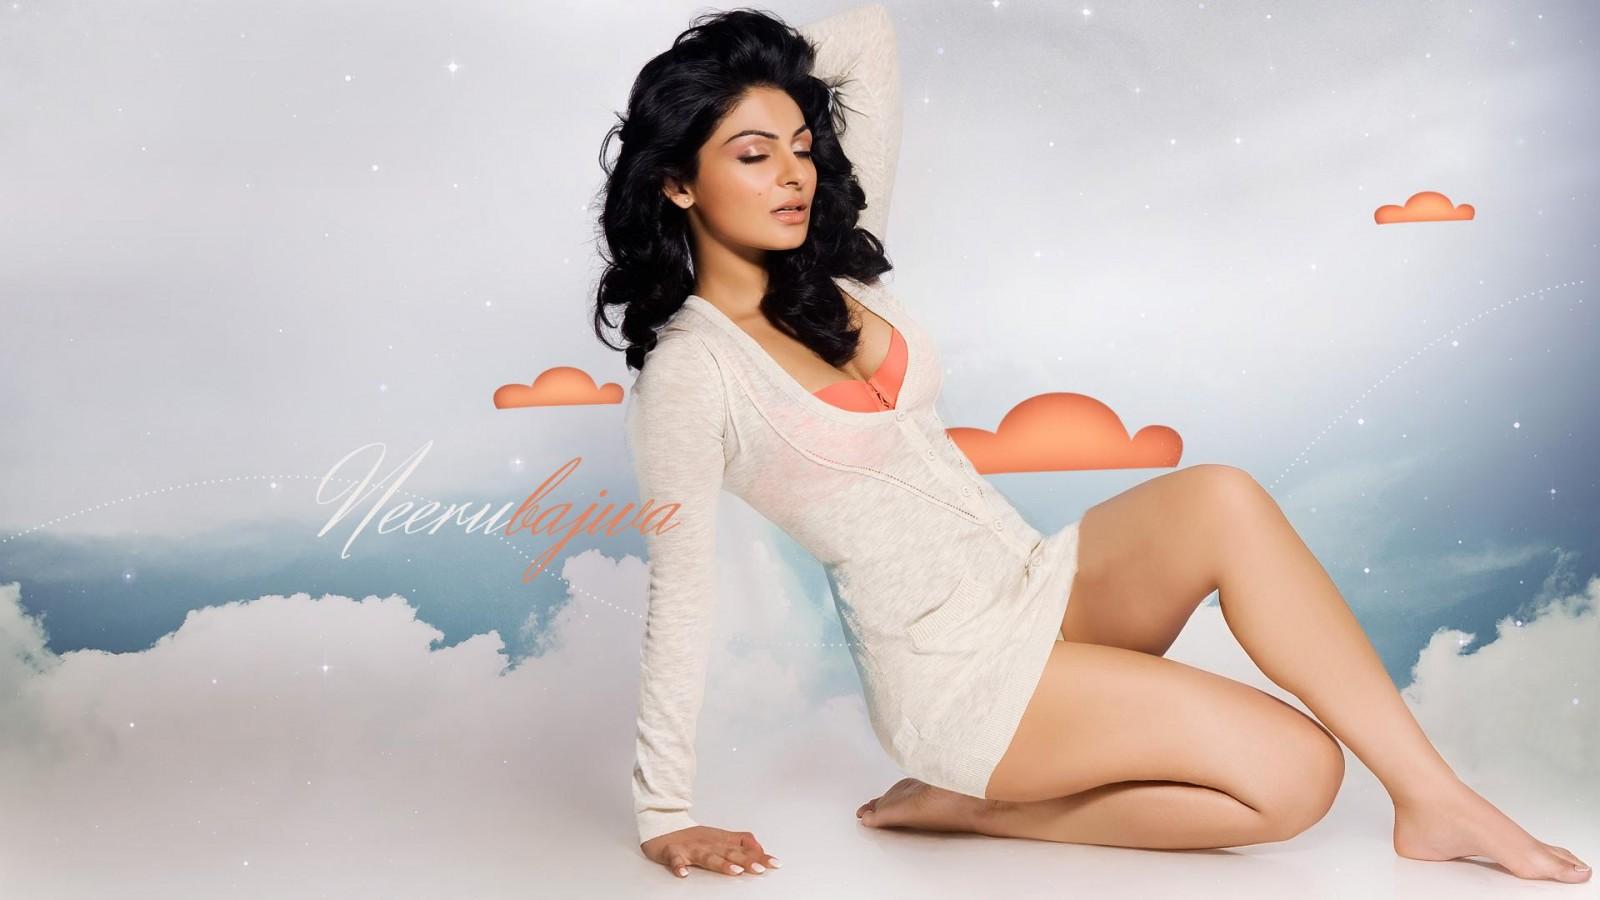 Bollywood Celebrity Neeru Bajwa Hot